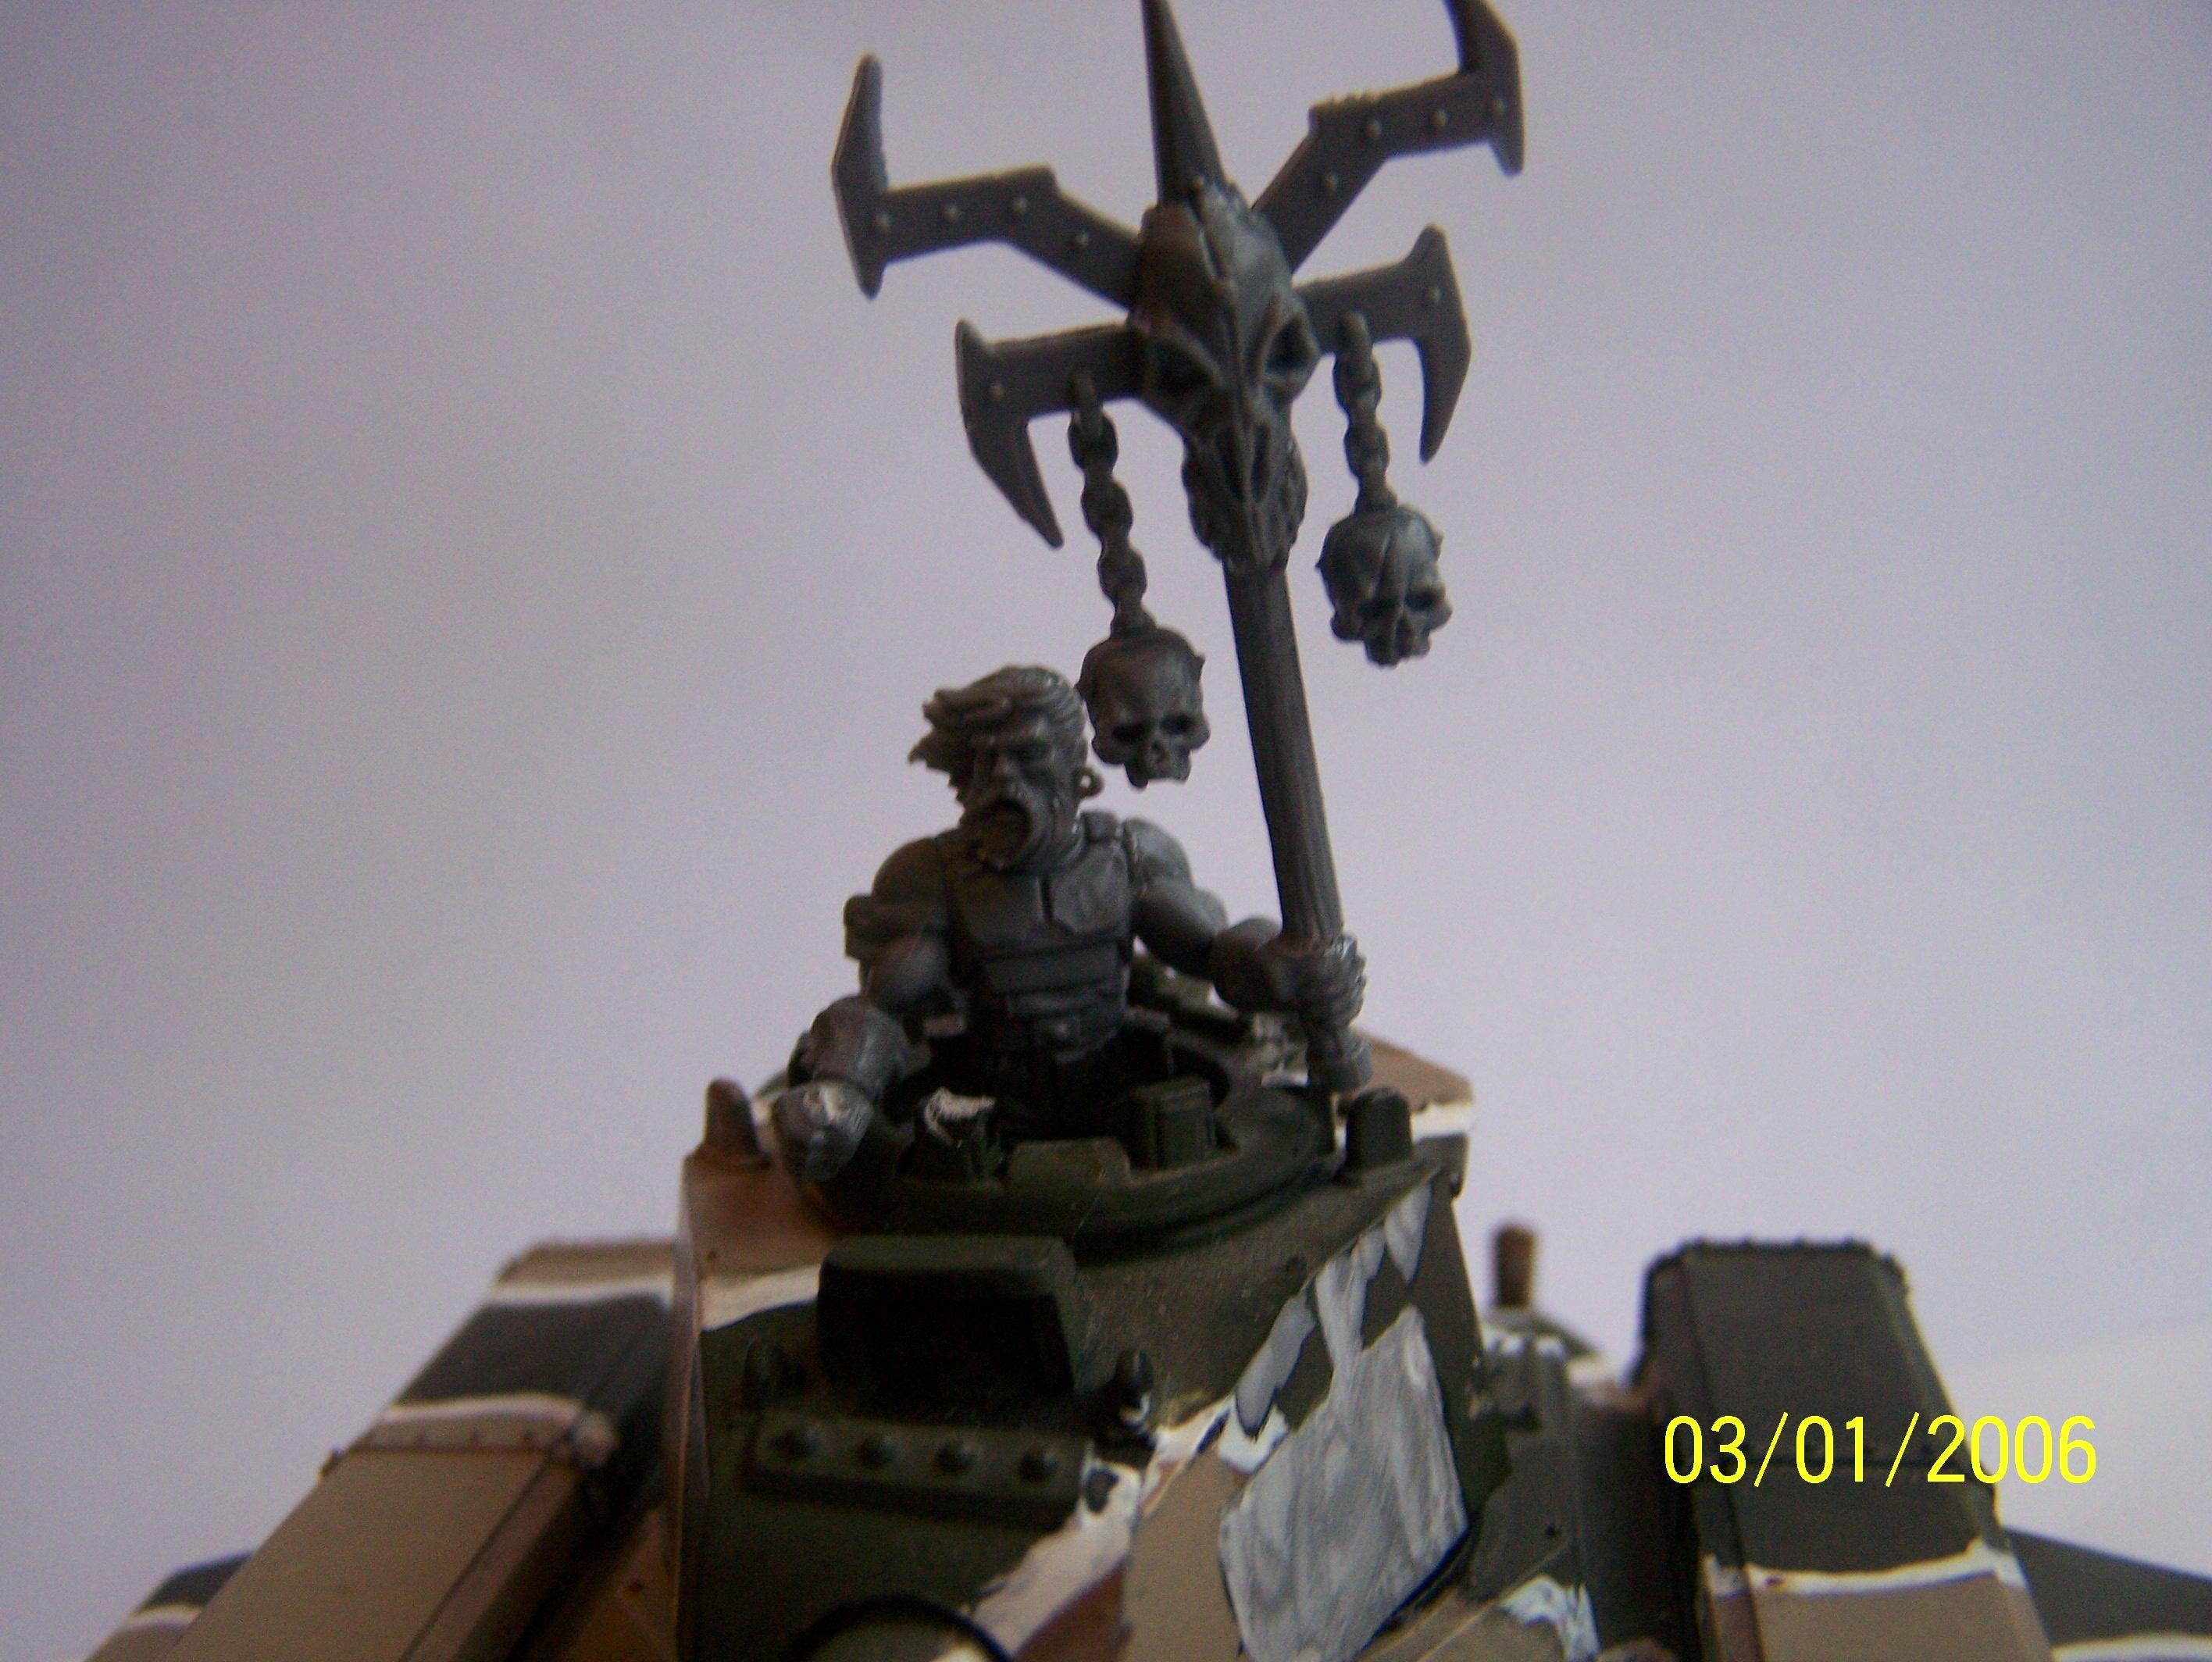 Khorne, Renegade Guard, Tank, Traitor Guard, Warhammer 40,000, Work In Progress